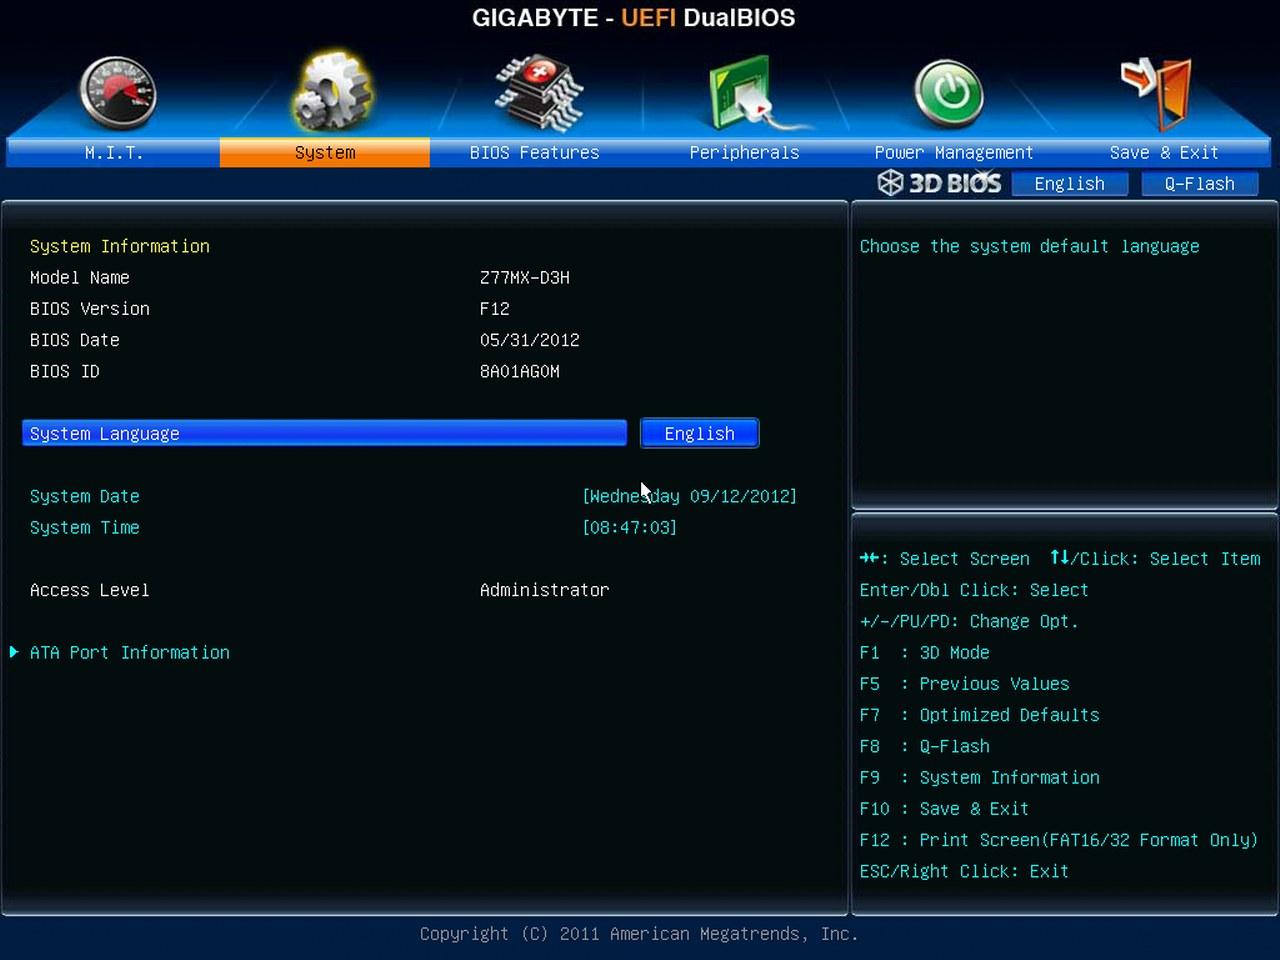 Gigabyte Z77X-UD5H-WB WIFI, BIOS UEFI, System